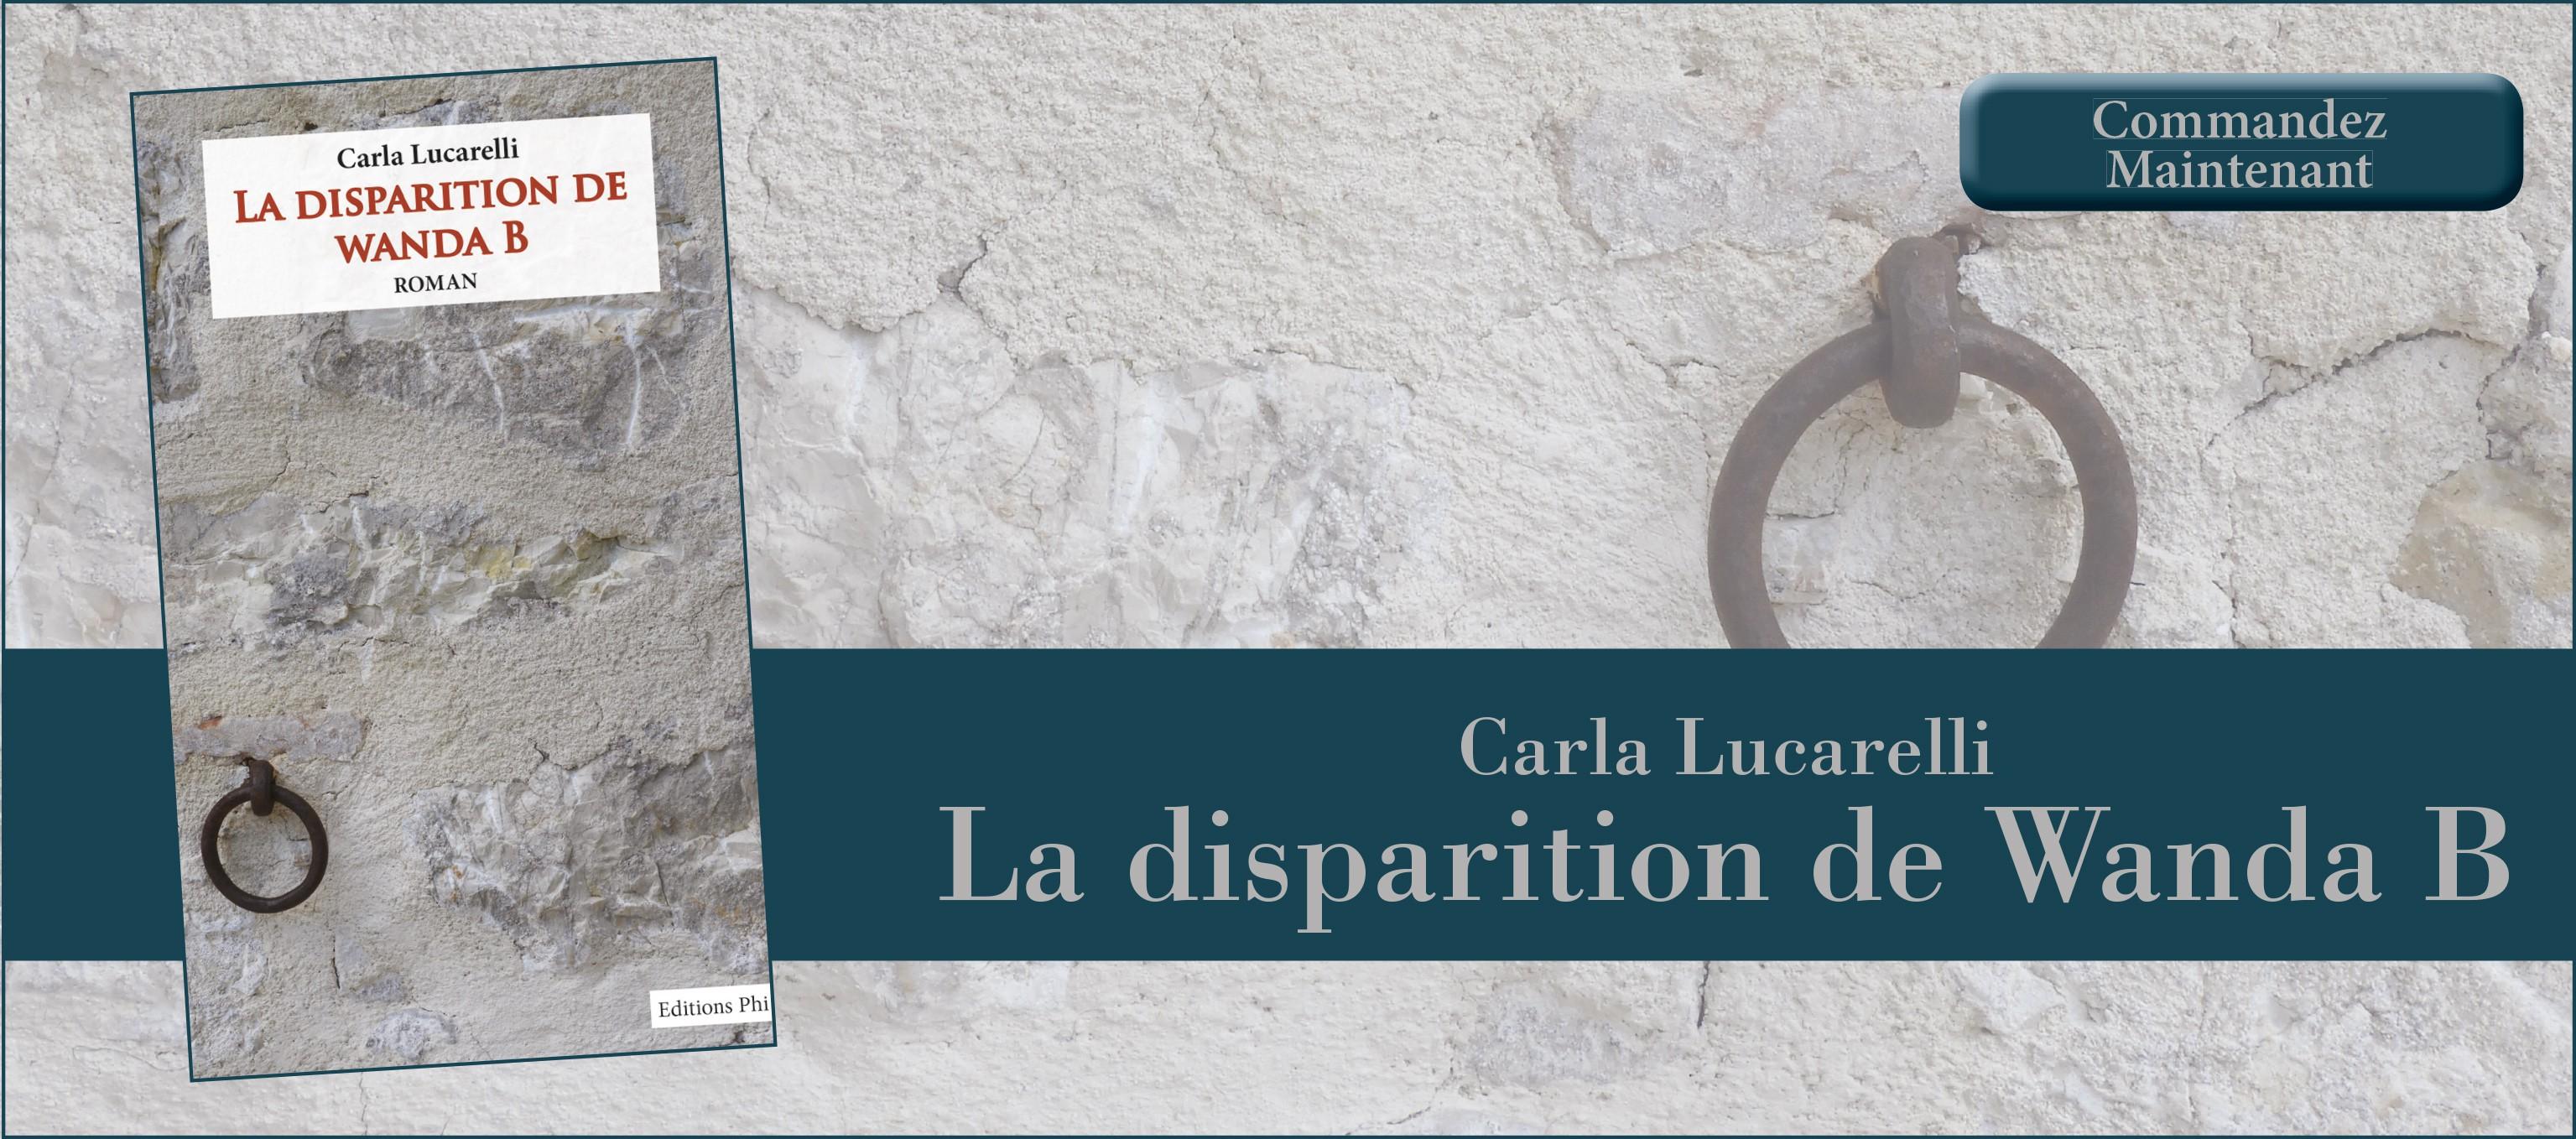 Carla Lucarelli : La disparition de Wanda B